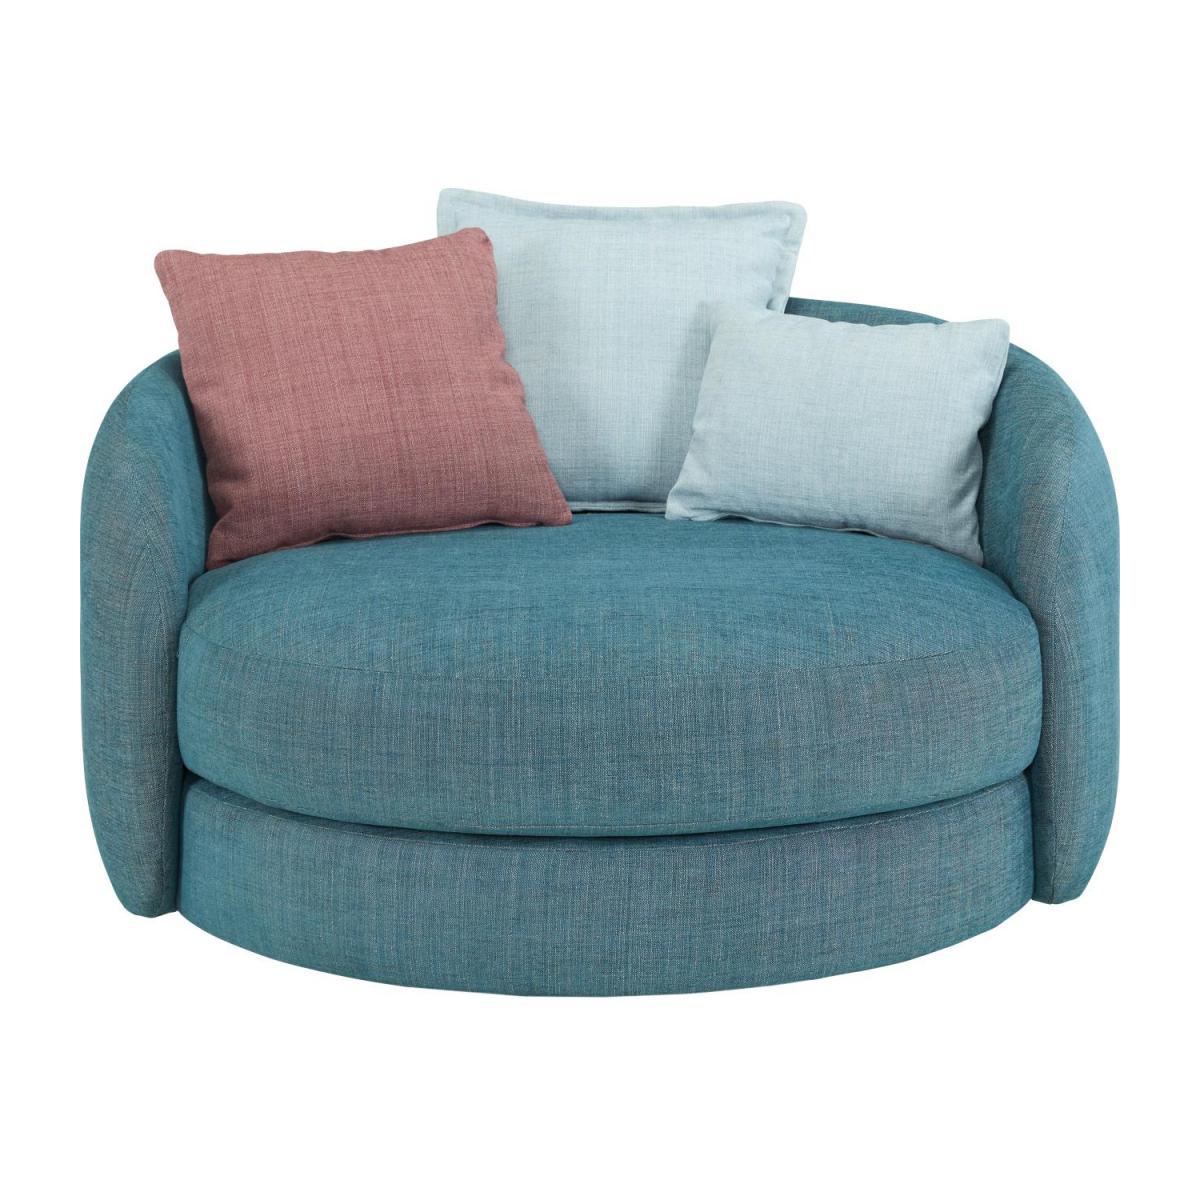 Full Size of Runder Zweisitzer Sofa Indomo Big Grau Karup Baxter Poco Cognac Ecksofa Garten 3 Sitzer Abnehmbarer Bezug Kolonialstil 3er Sofa Rundes Sofa